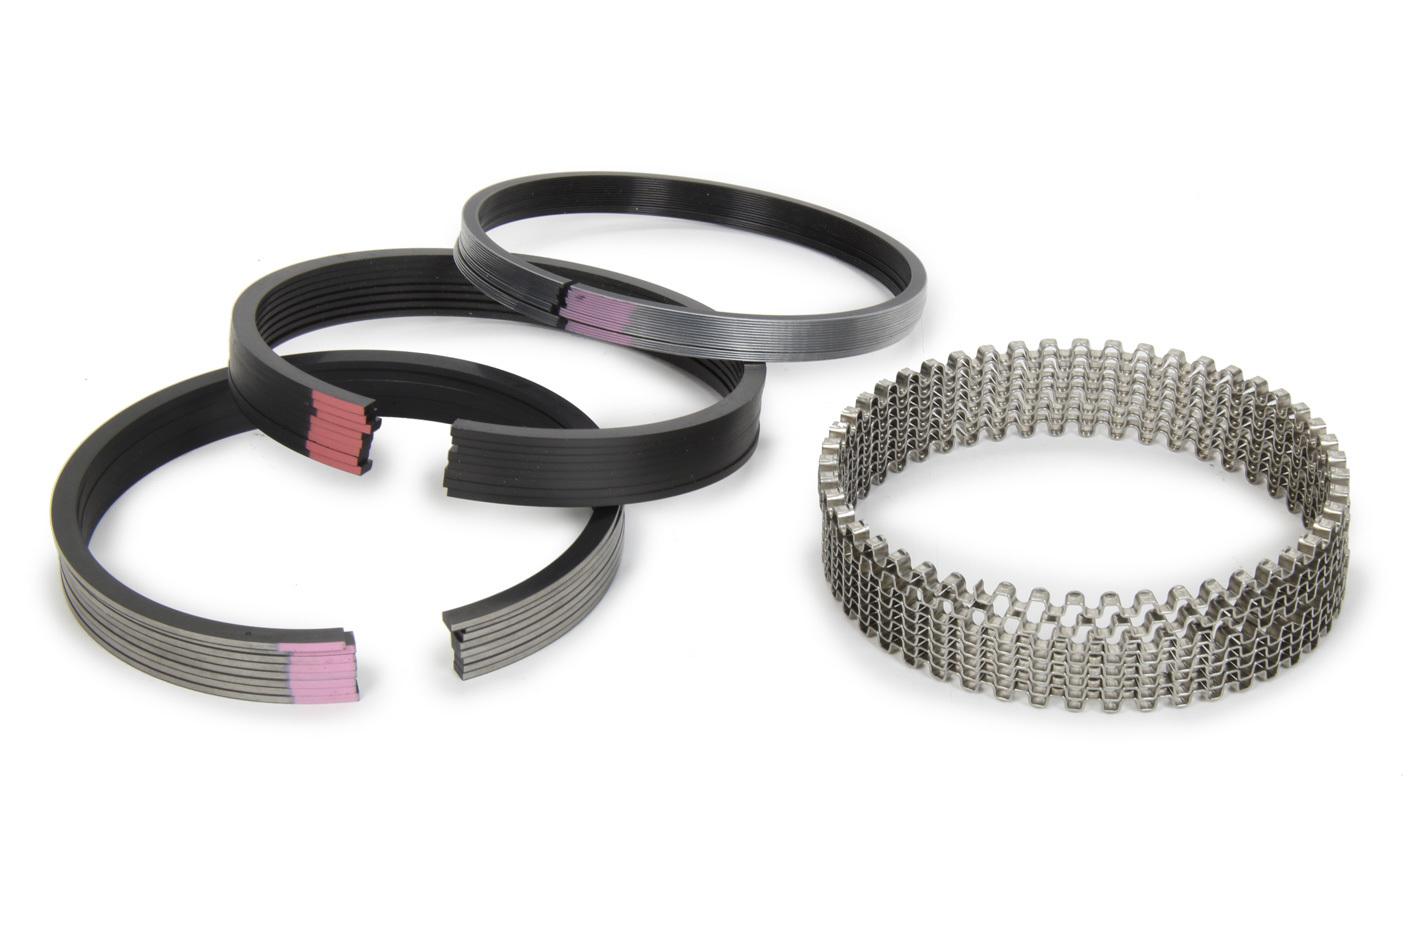 Piston Ring Set 4.270 Moly 5/64 5/64 3/16